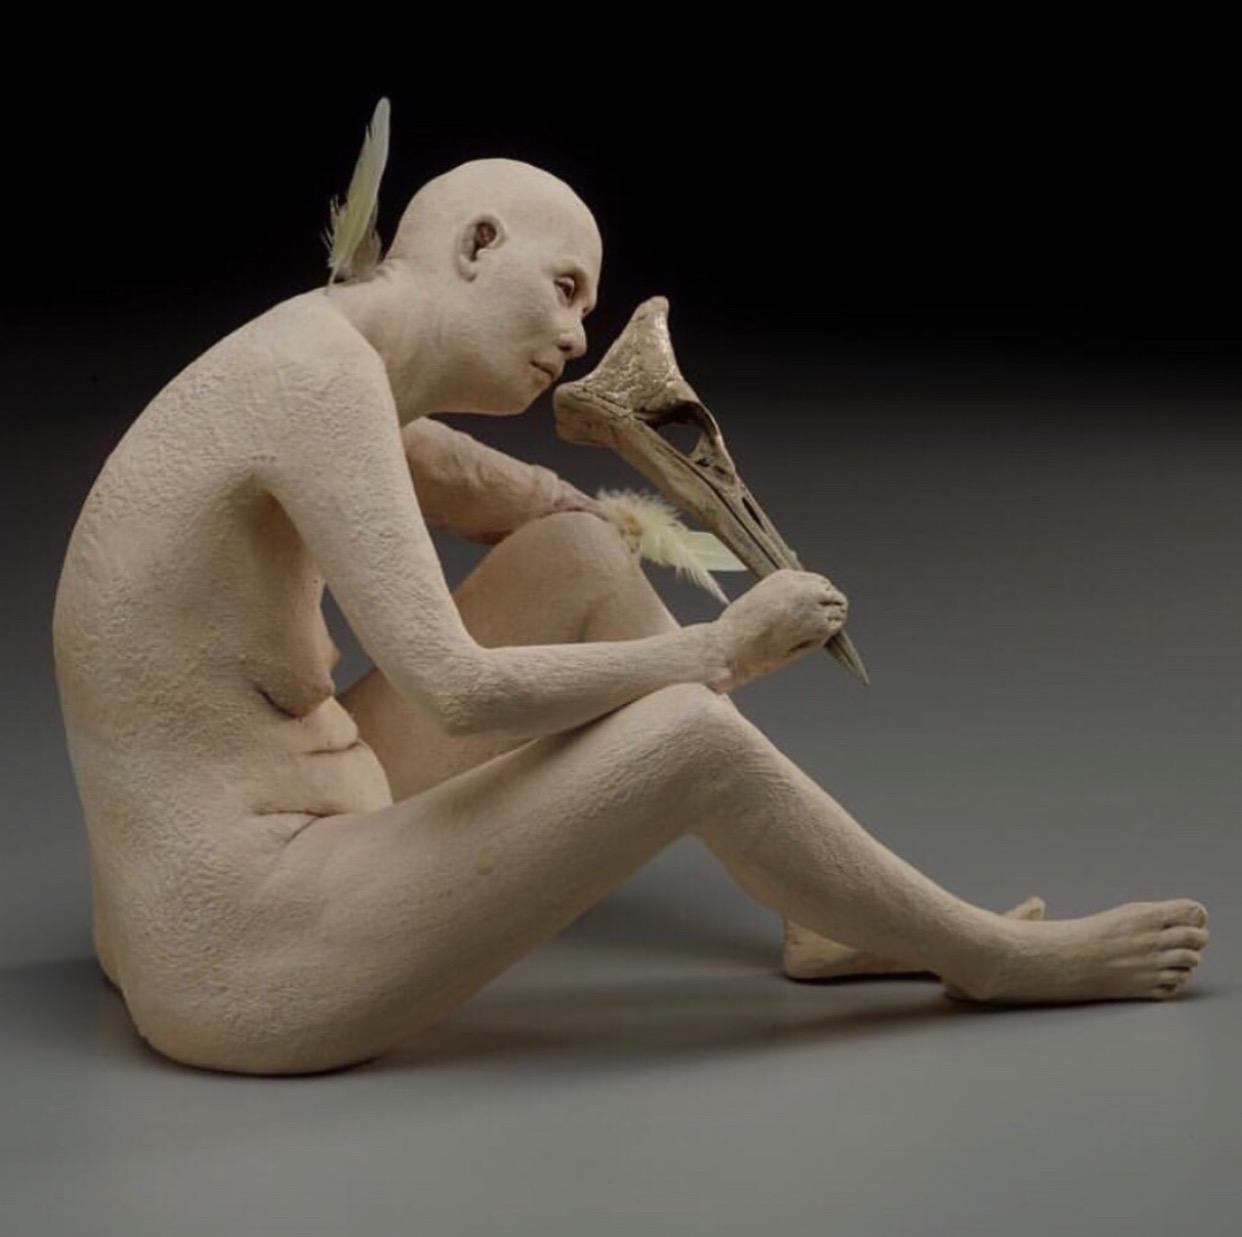 "SUSANNAH ZUCKER - ""Mask"", ceramic, feathers, bird skull, silver leaf 20179"" x 7"" x 12""$3,000"